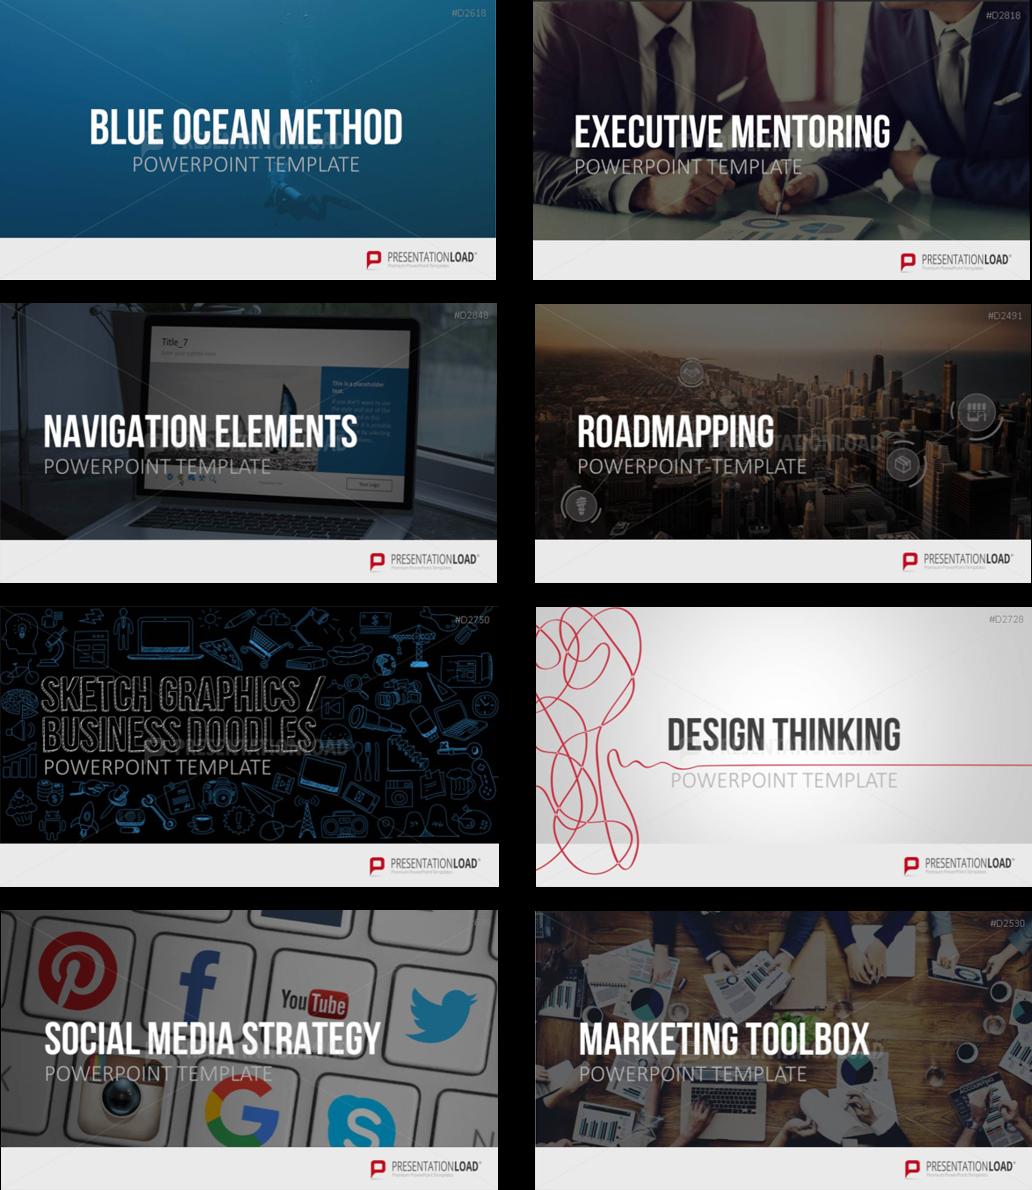 david scarpati - presentationload, Powerpoint templates